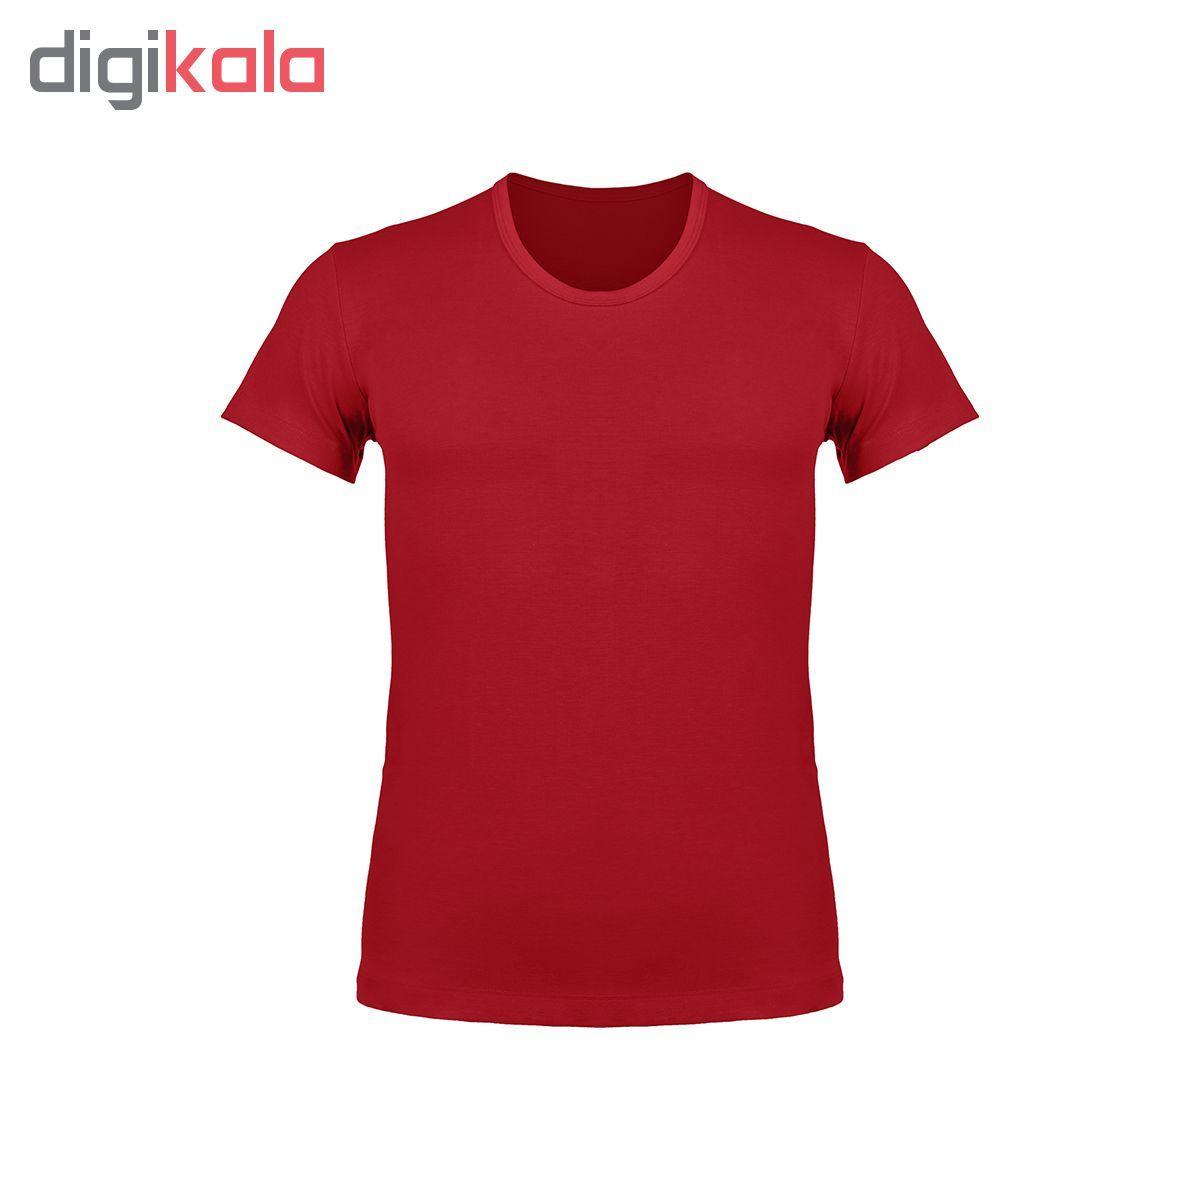 زیرپوش مردانه کیان تن پوش مدل U Neck Shirt Classic R main 1 1